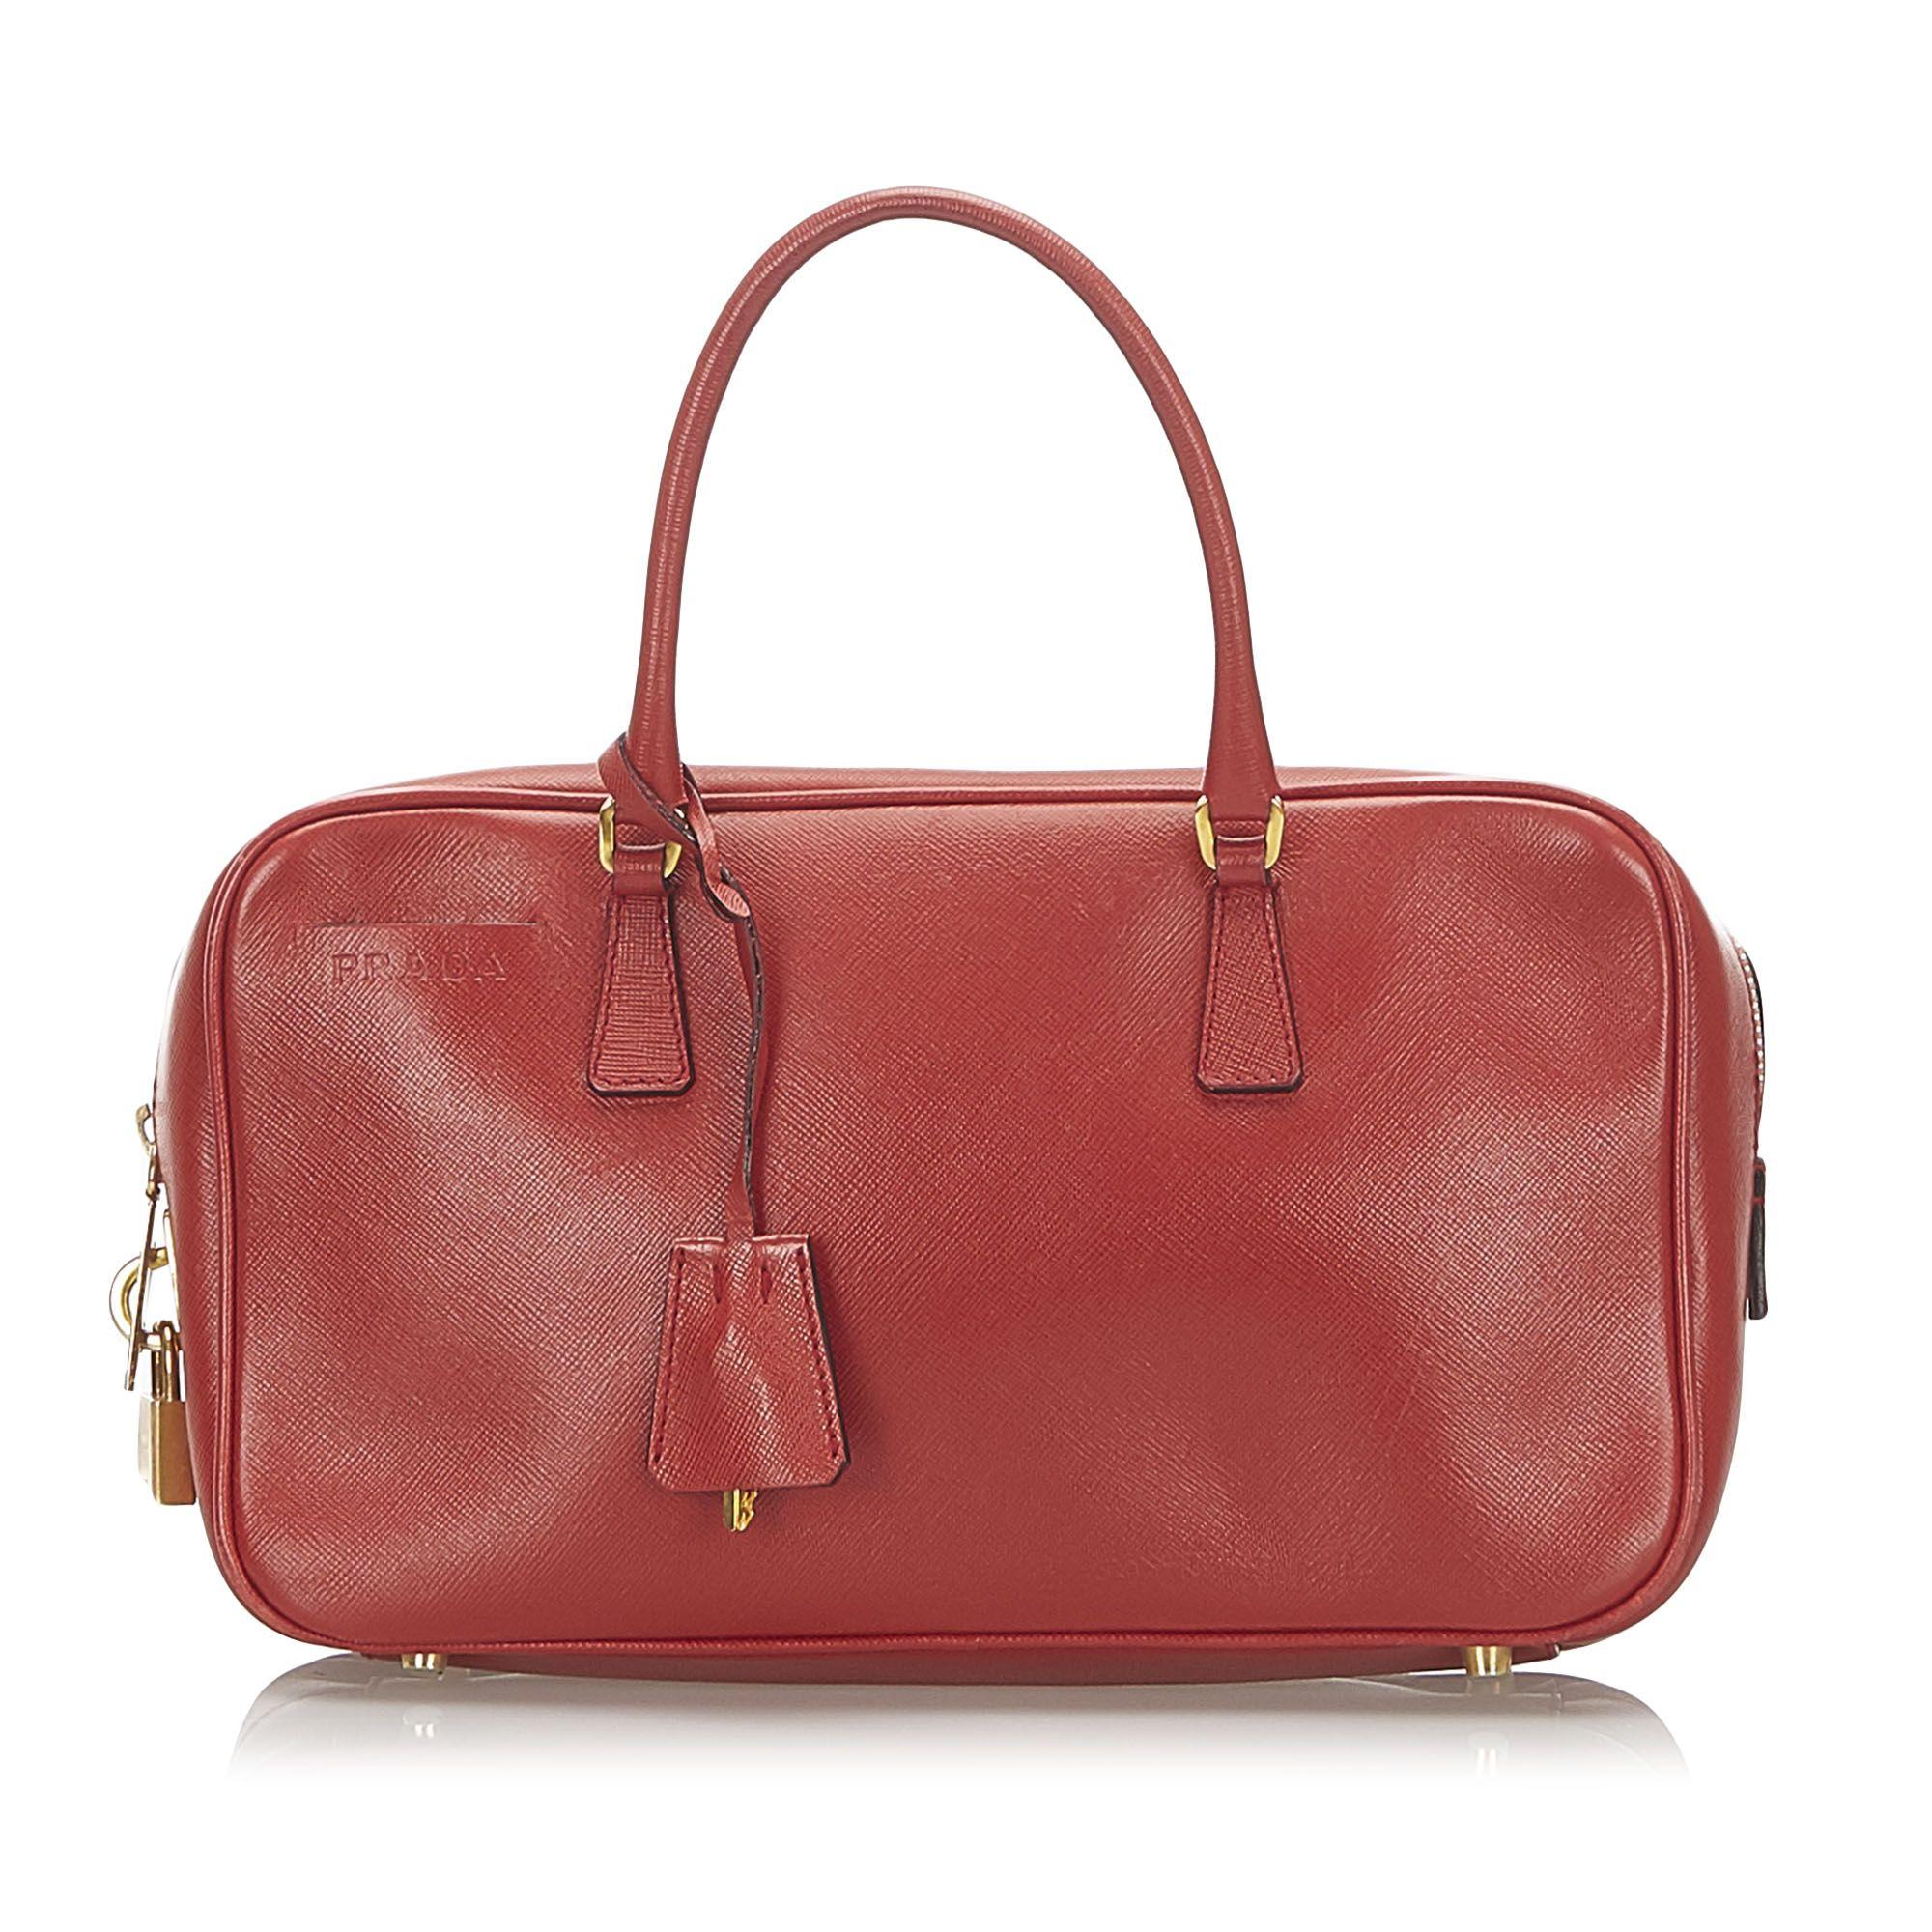 Vintage Prada Leather Handbag Red